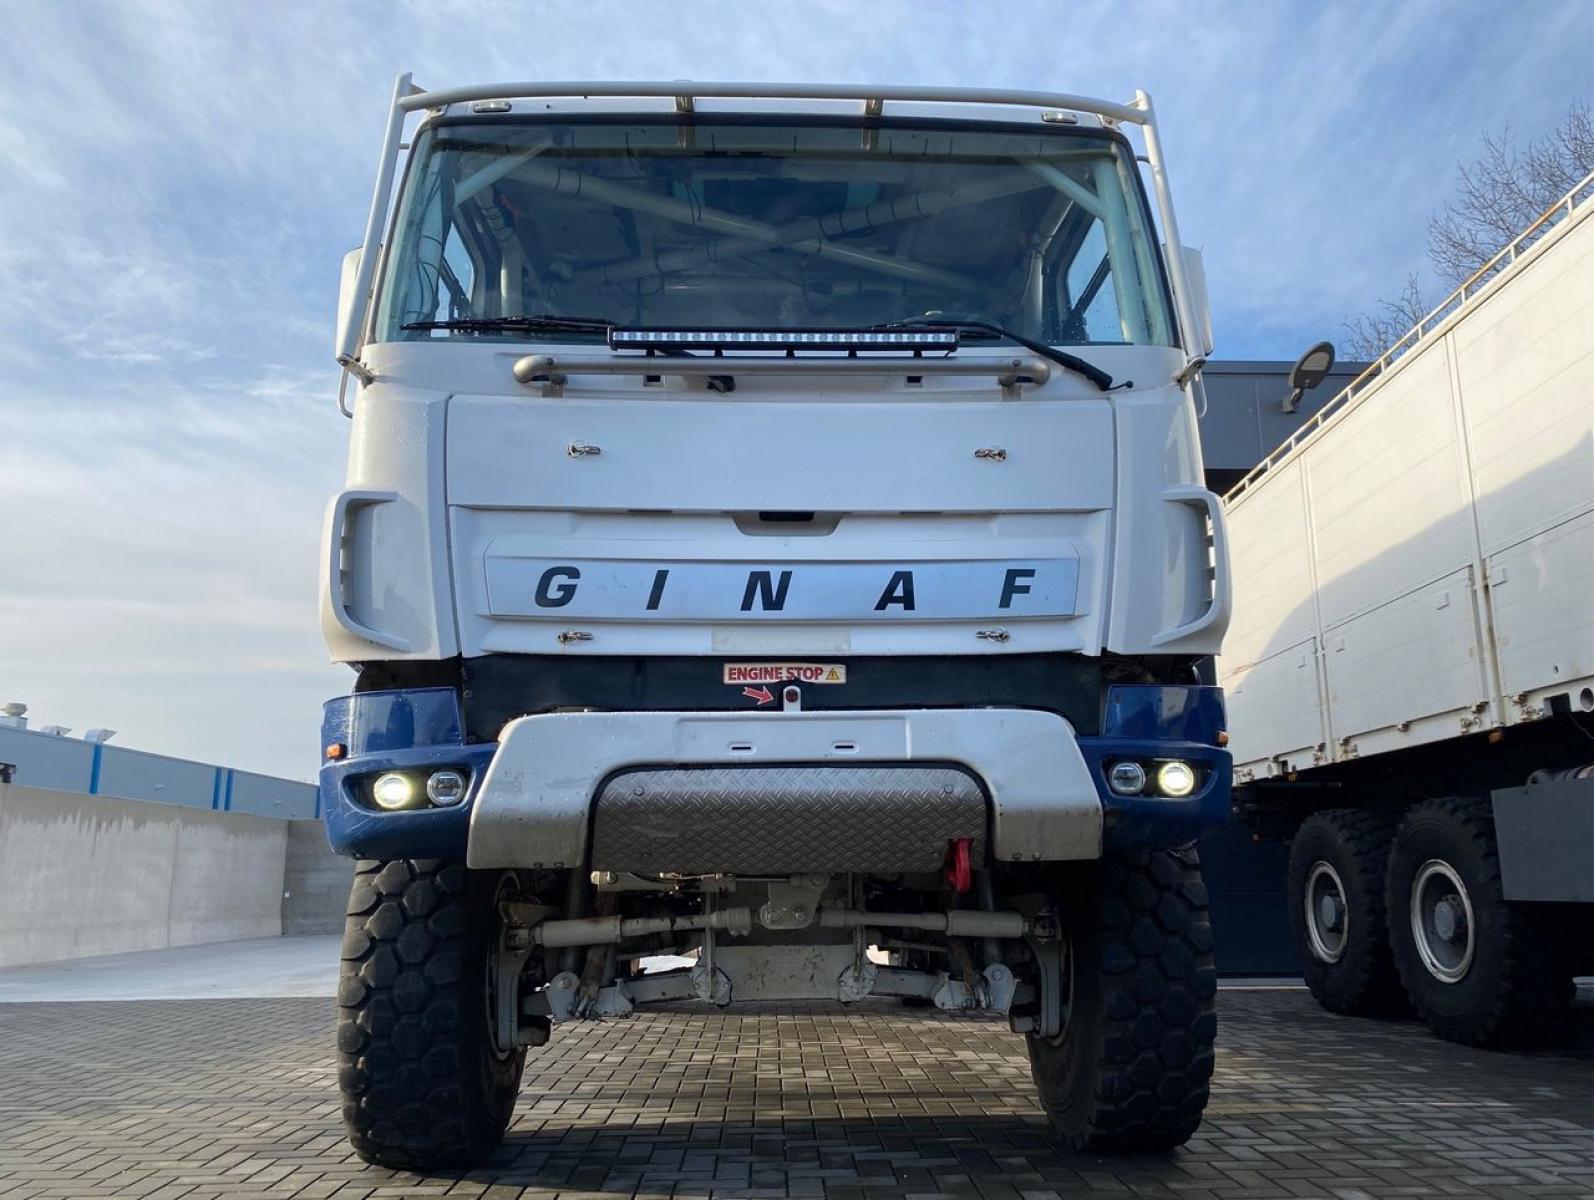 Ginaf X2222 4x4 - 2